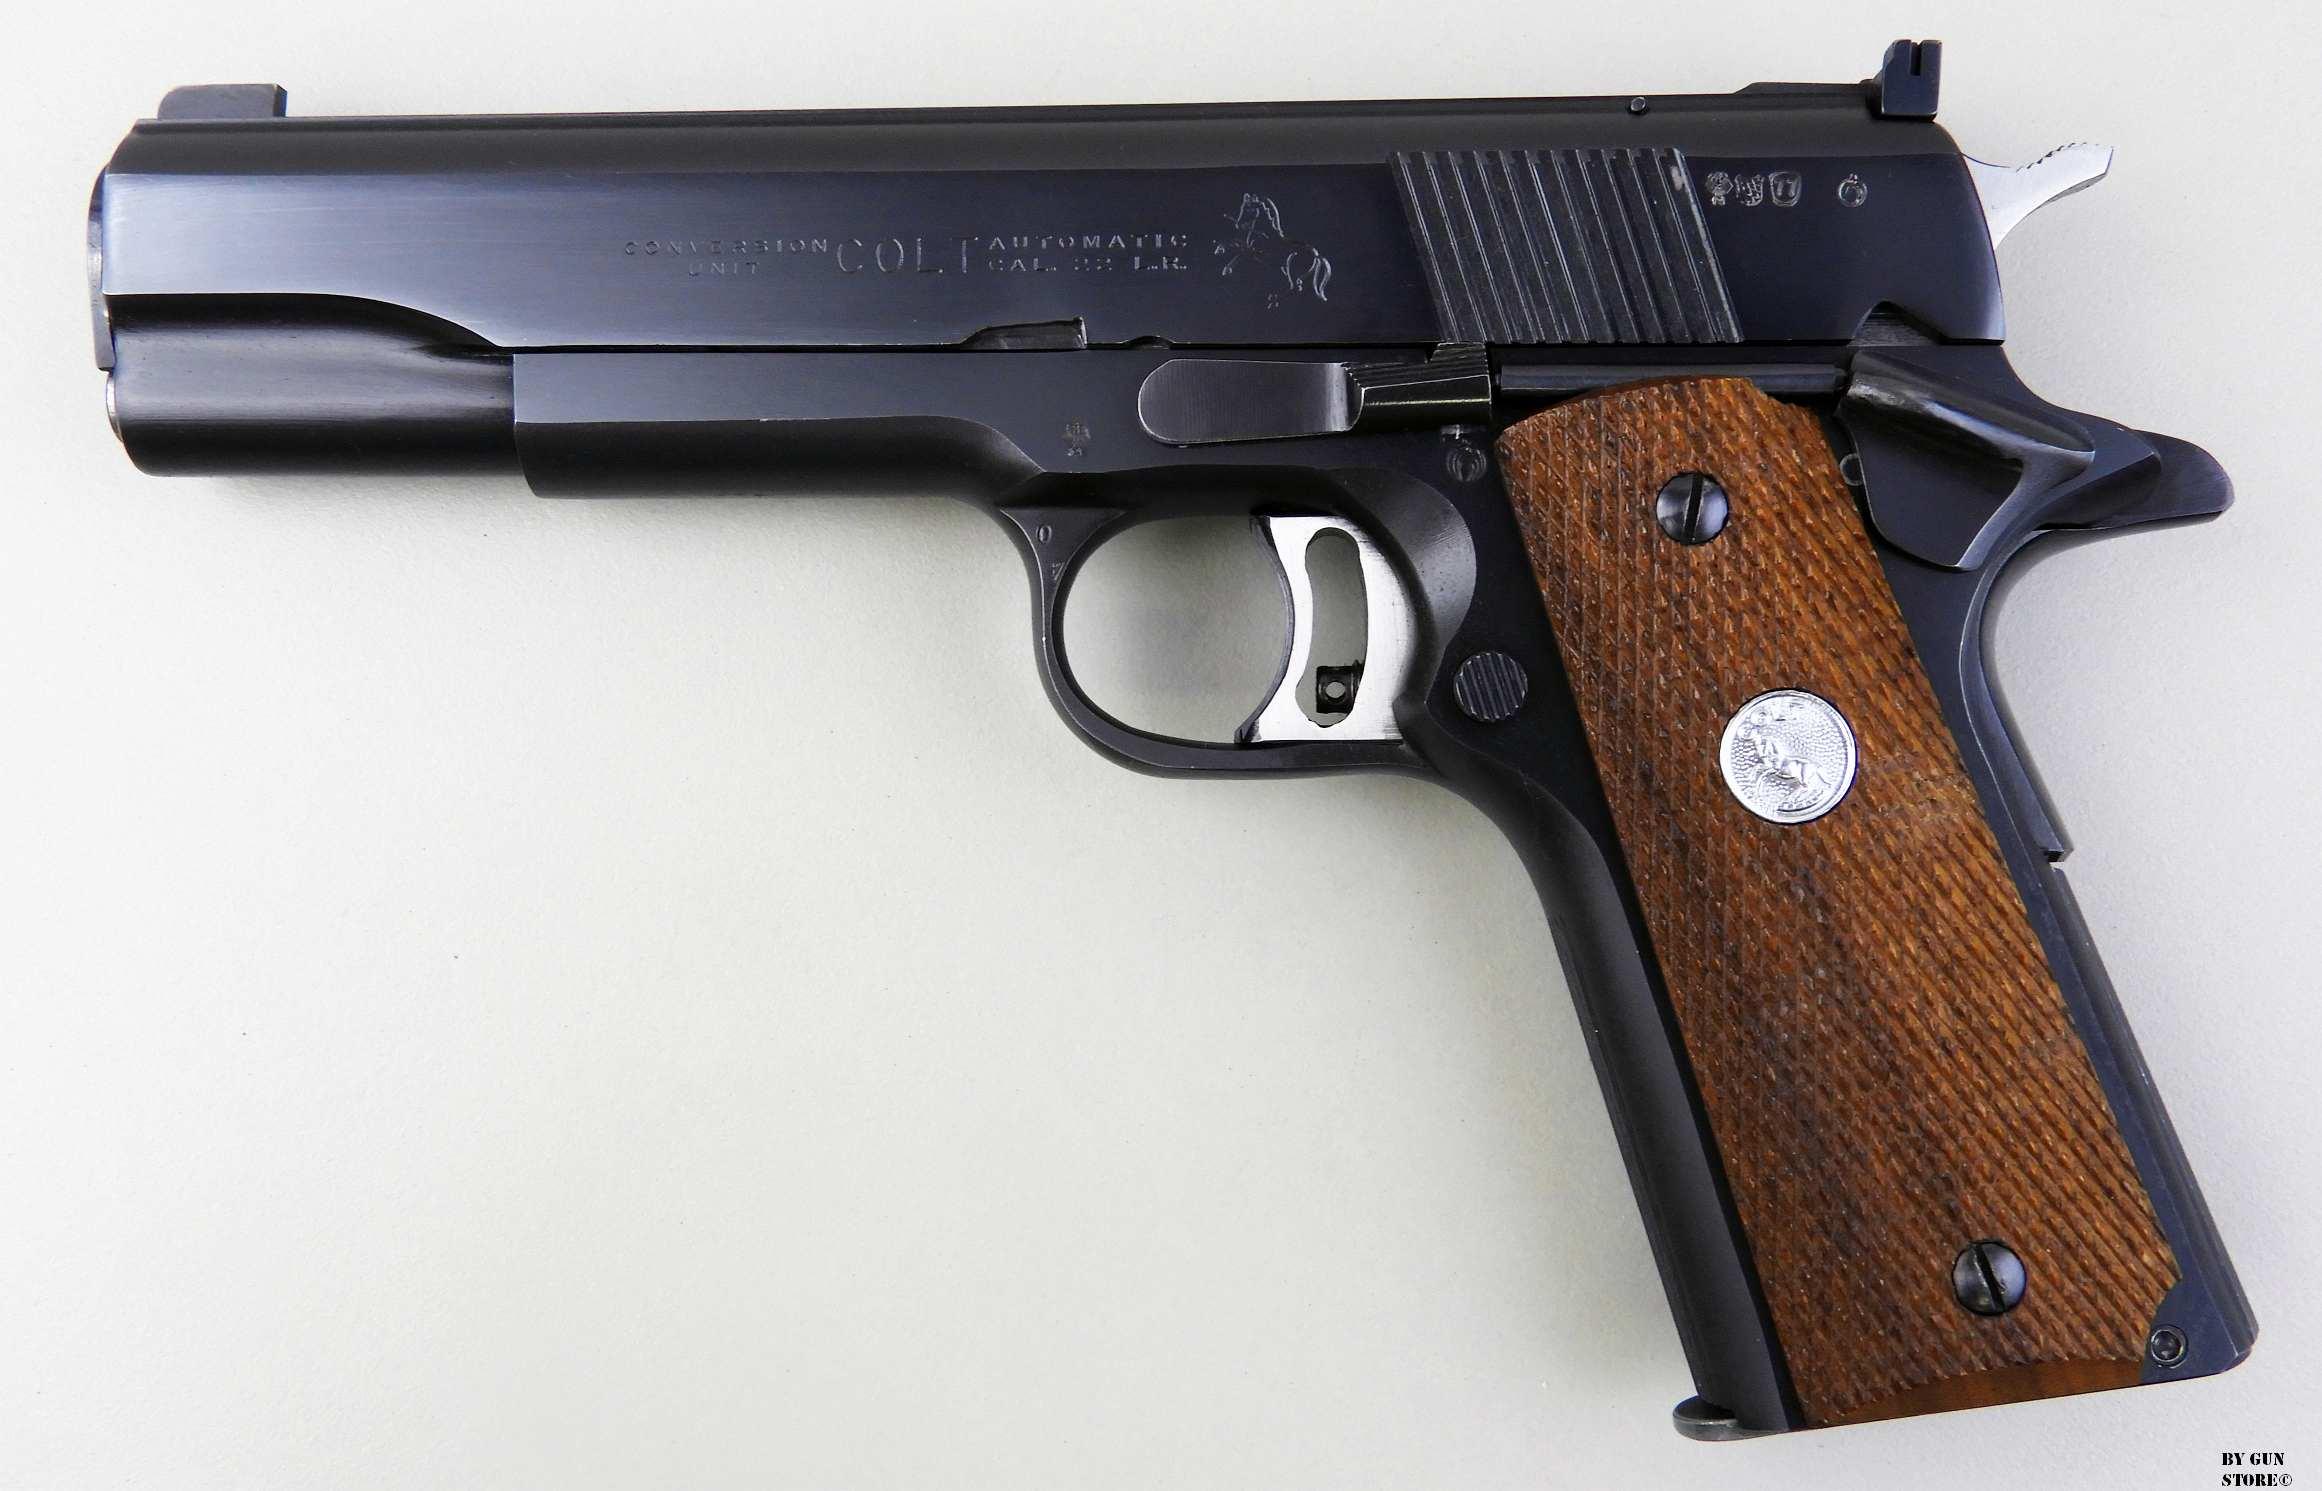 Ww2 Wehrmacht Holster Nera Borsa pistole per pistole breve 7.65 tipo PPK